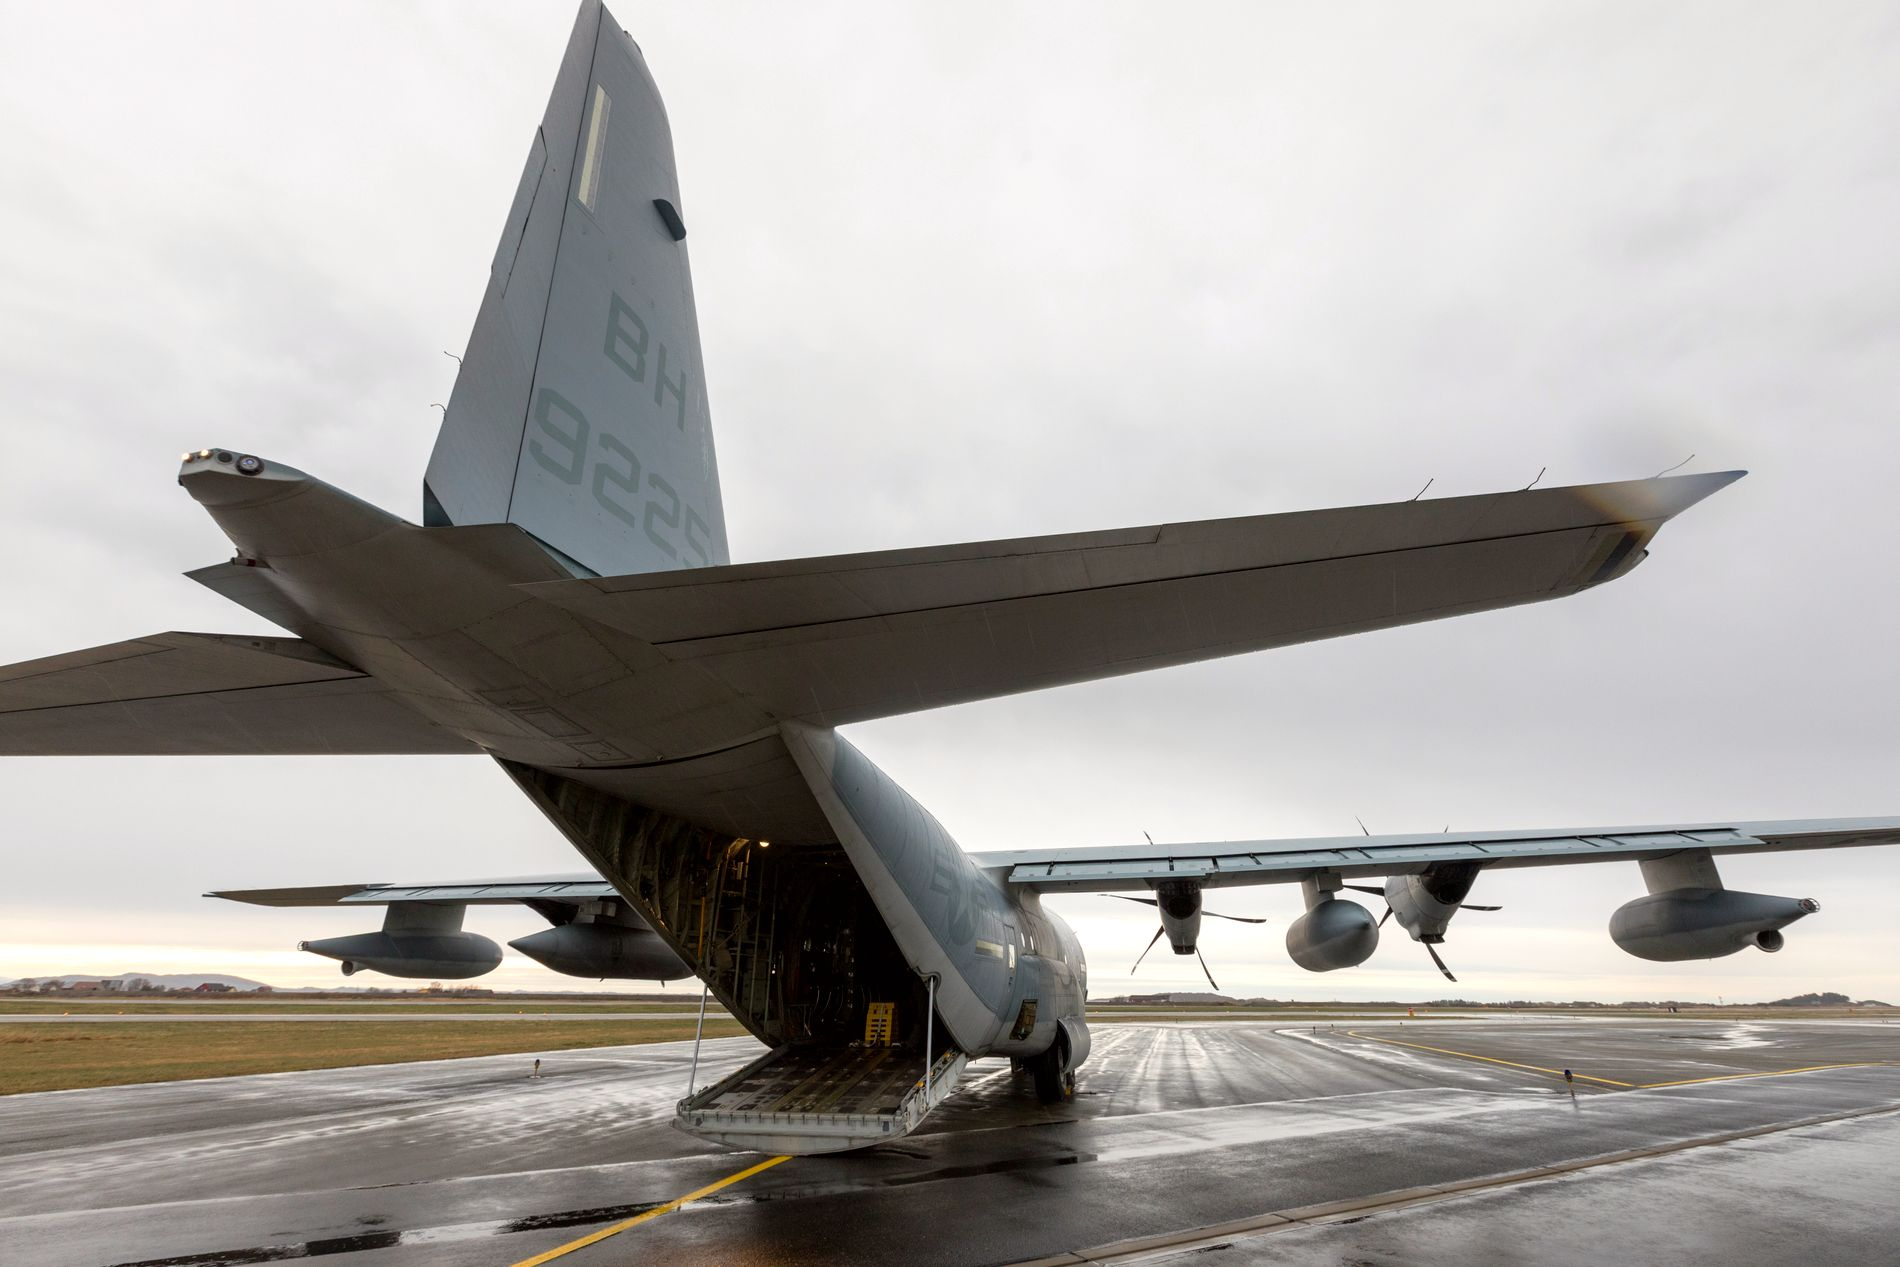 US Marines c-130 transportfly under Trident Juncture, den store NATO-øvelsen. Bildet er fra Ørlandet. Forsvarsdepartementet sier at Russland forstyrret GPS-signalene i perioden mellom 16. oktober og 7. november, og at det er bakkestyrker på Kolahalvøya som står bak. Foto: Gorm Kallestad / NTB scanpix